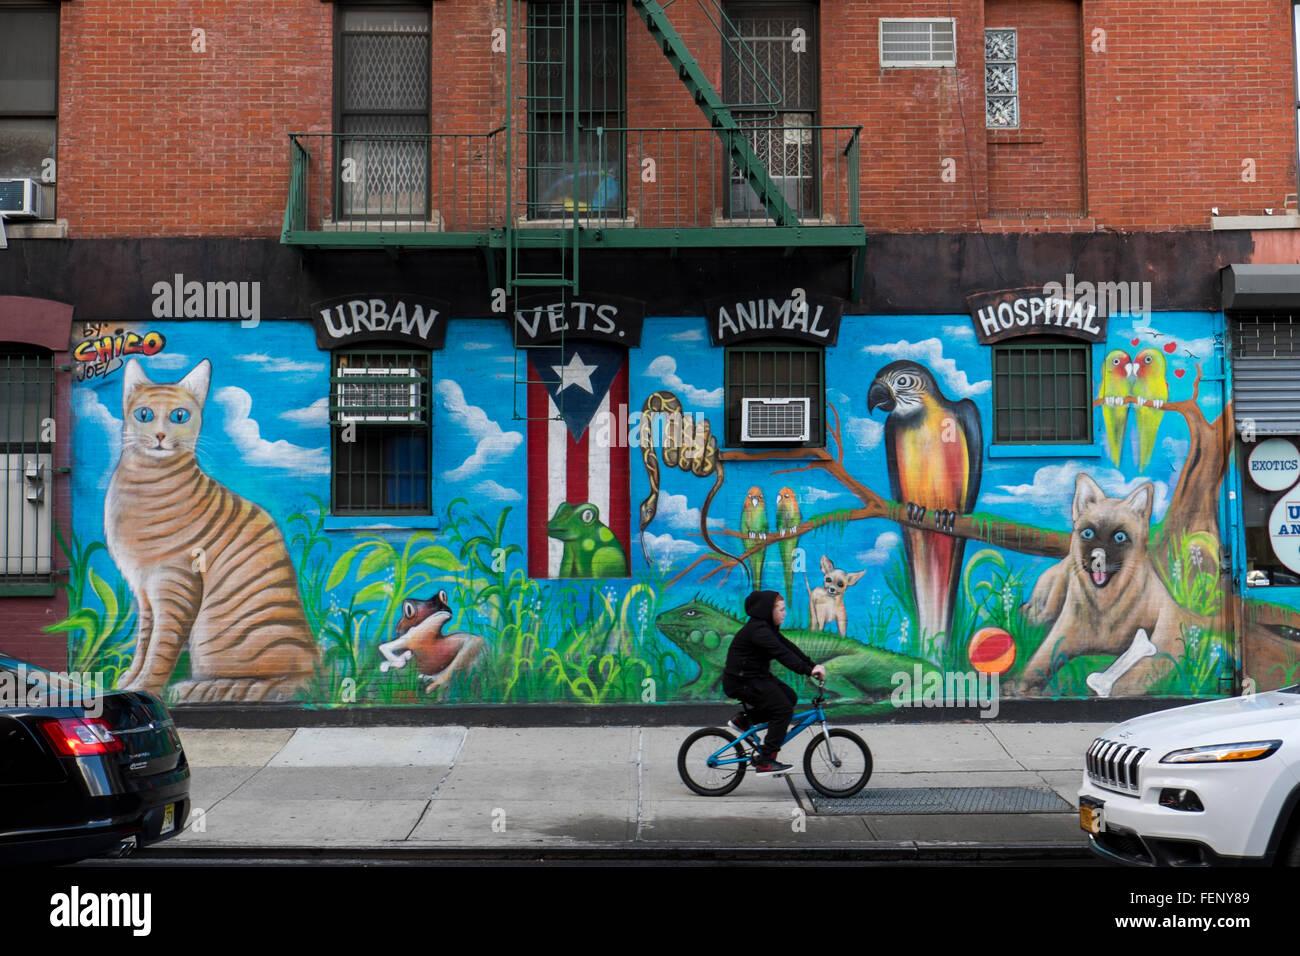 Urban Vets Animal Hospital, East Village, NYC - Stock Image